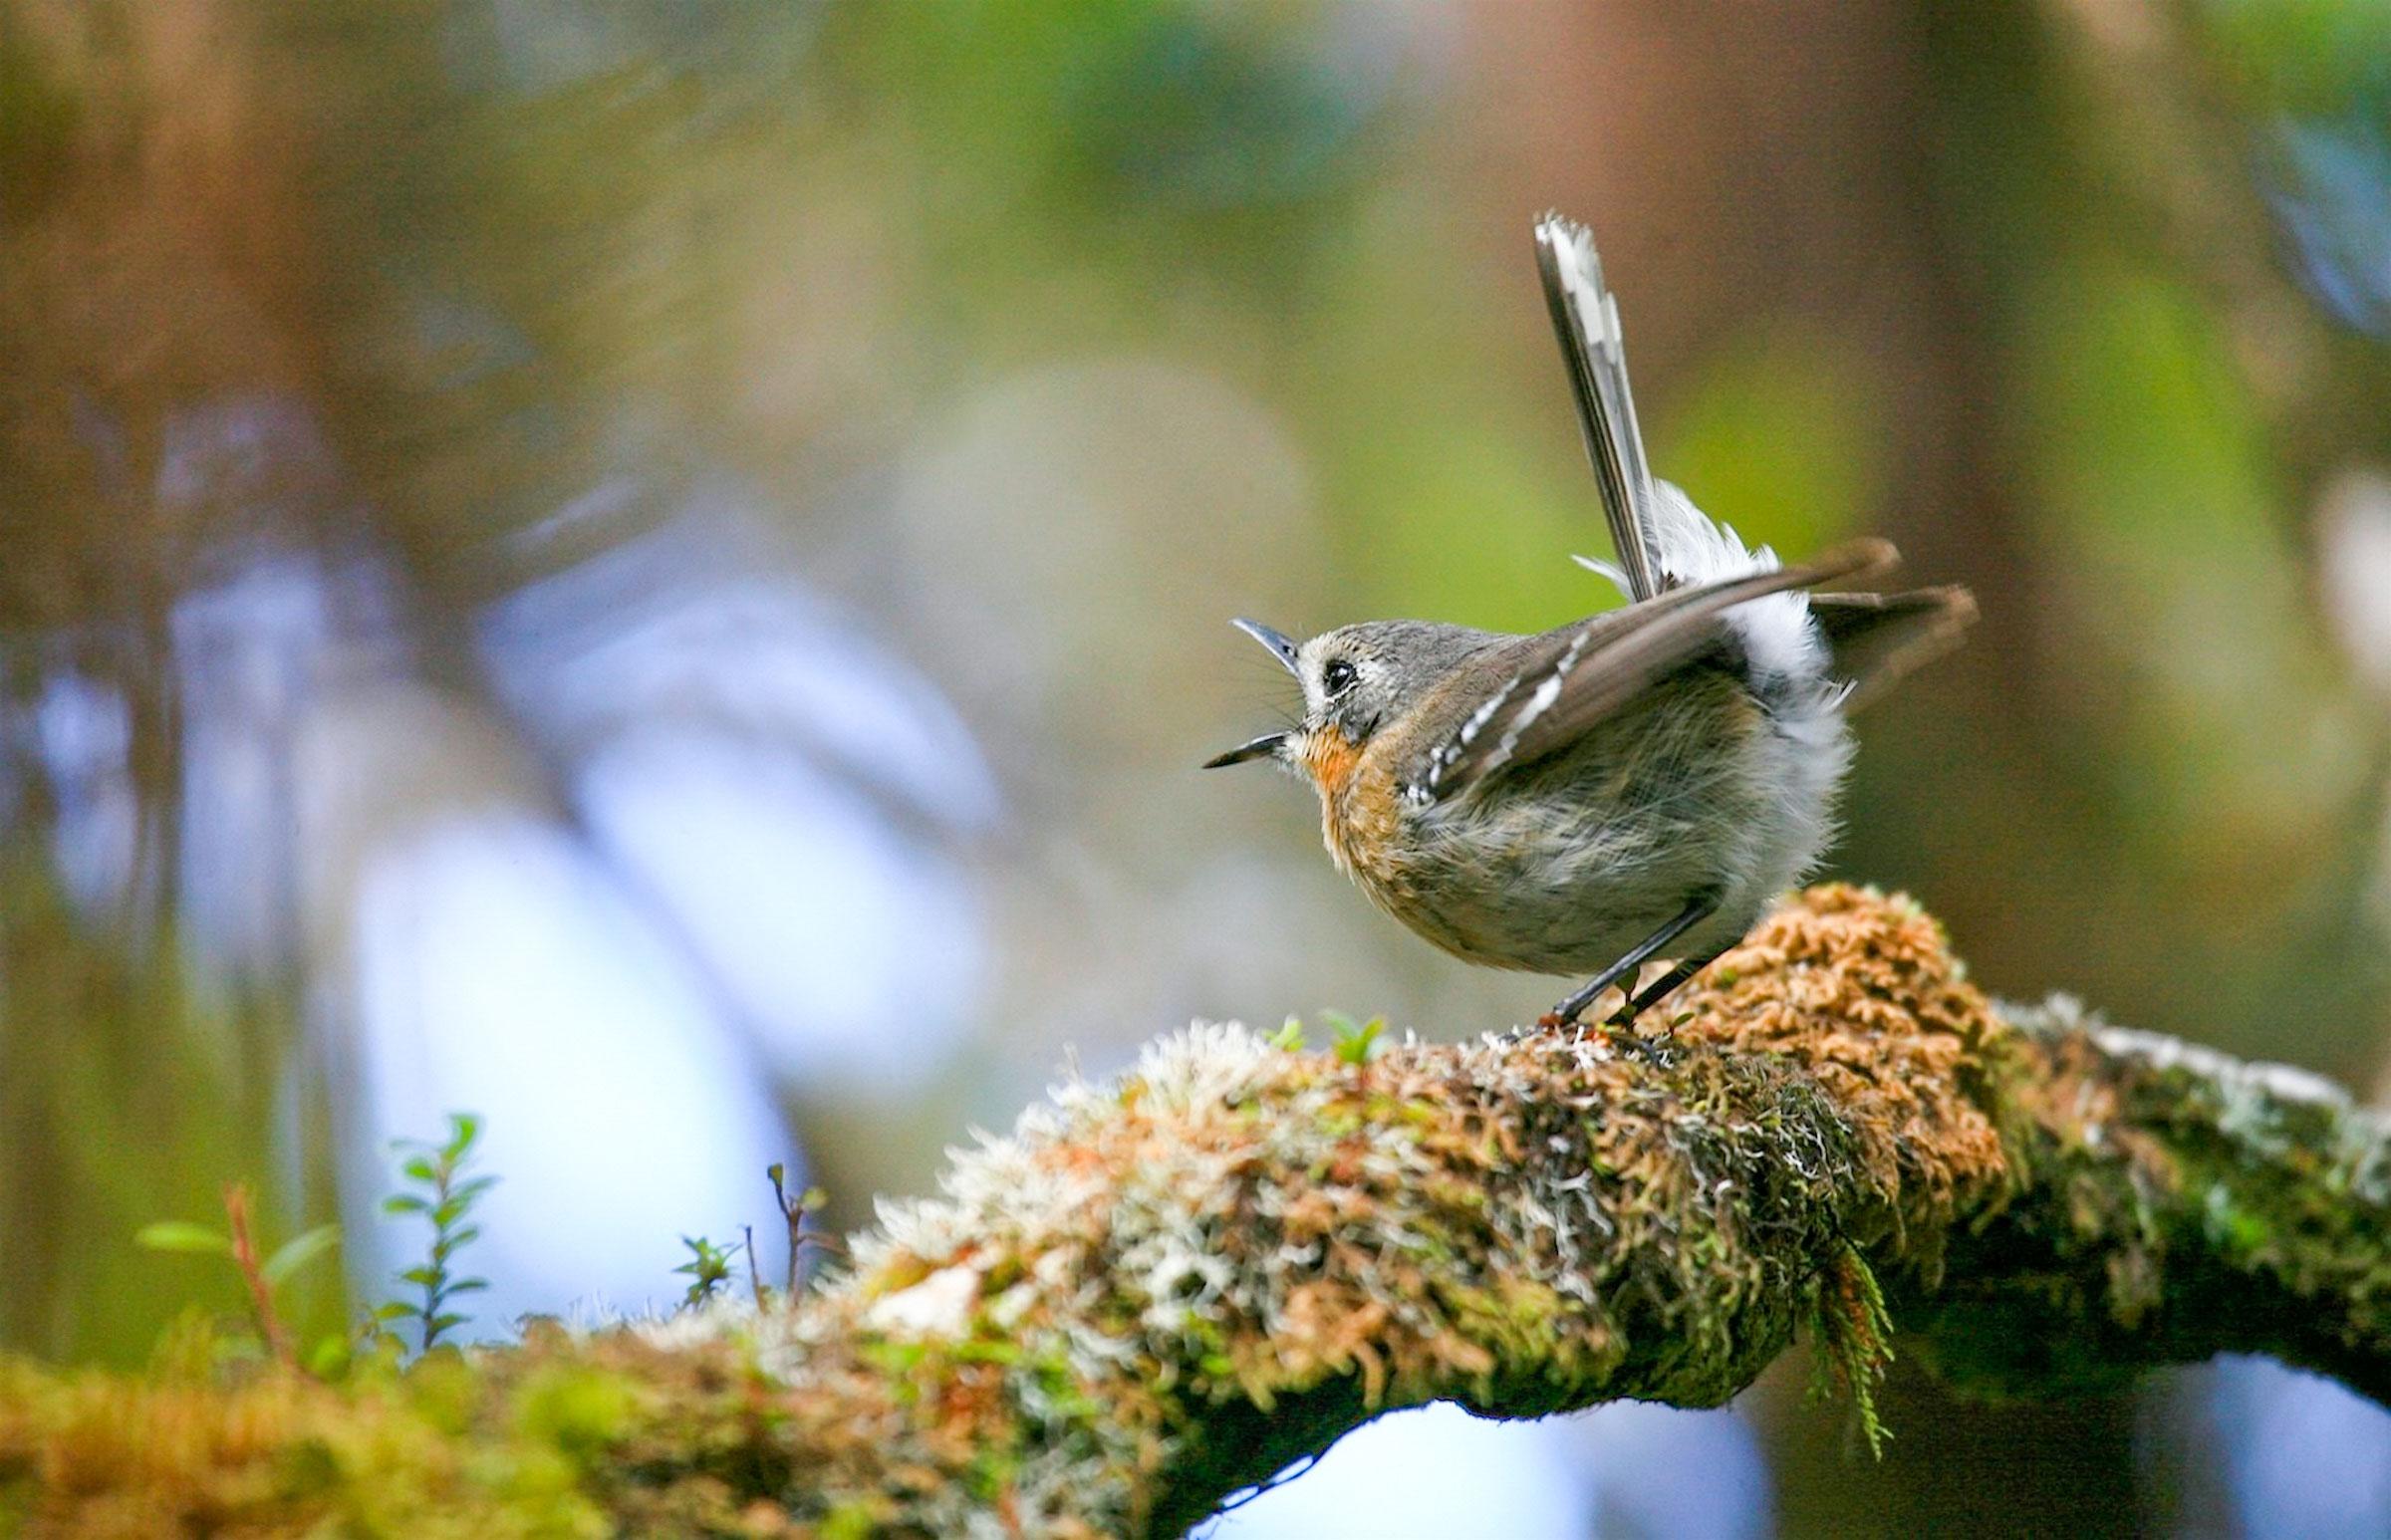 'Elepaio. Mitch Walters/Audubon Photography Awards